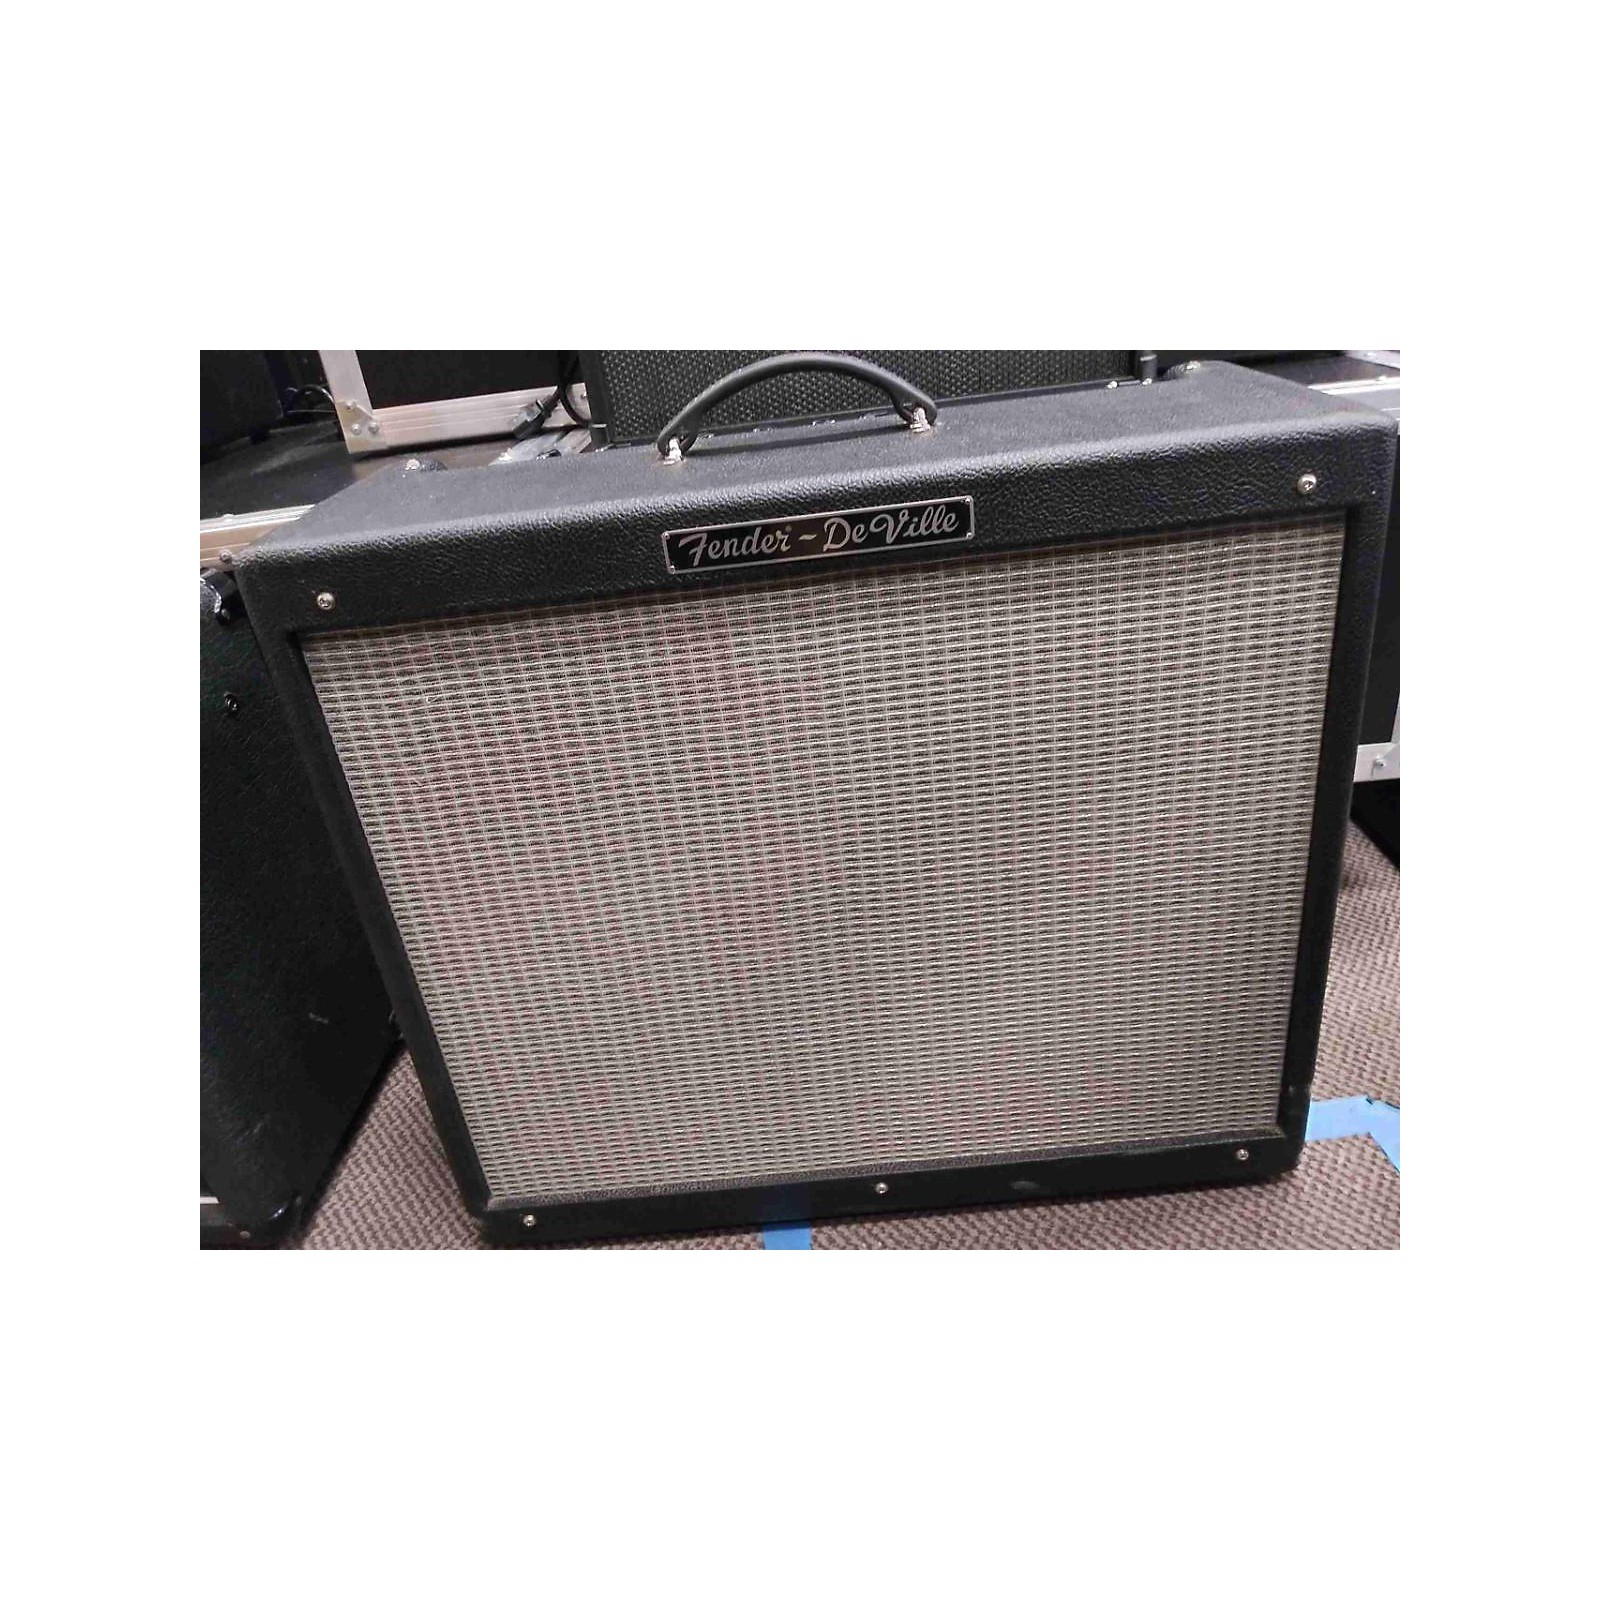 Fender Hot Rod Deville II 60W 2x12 Tube Guitar Combo Amp